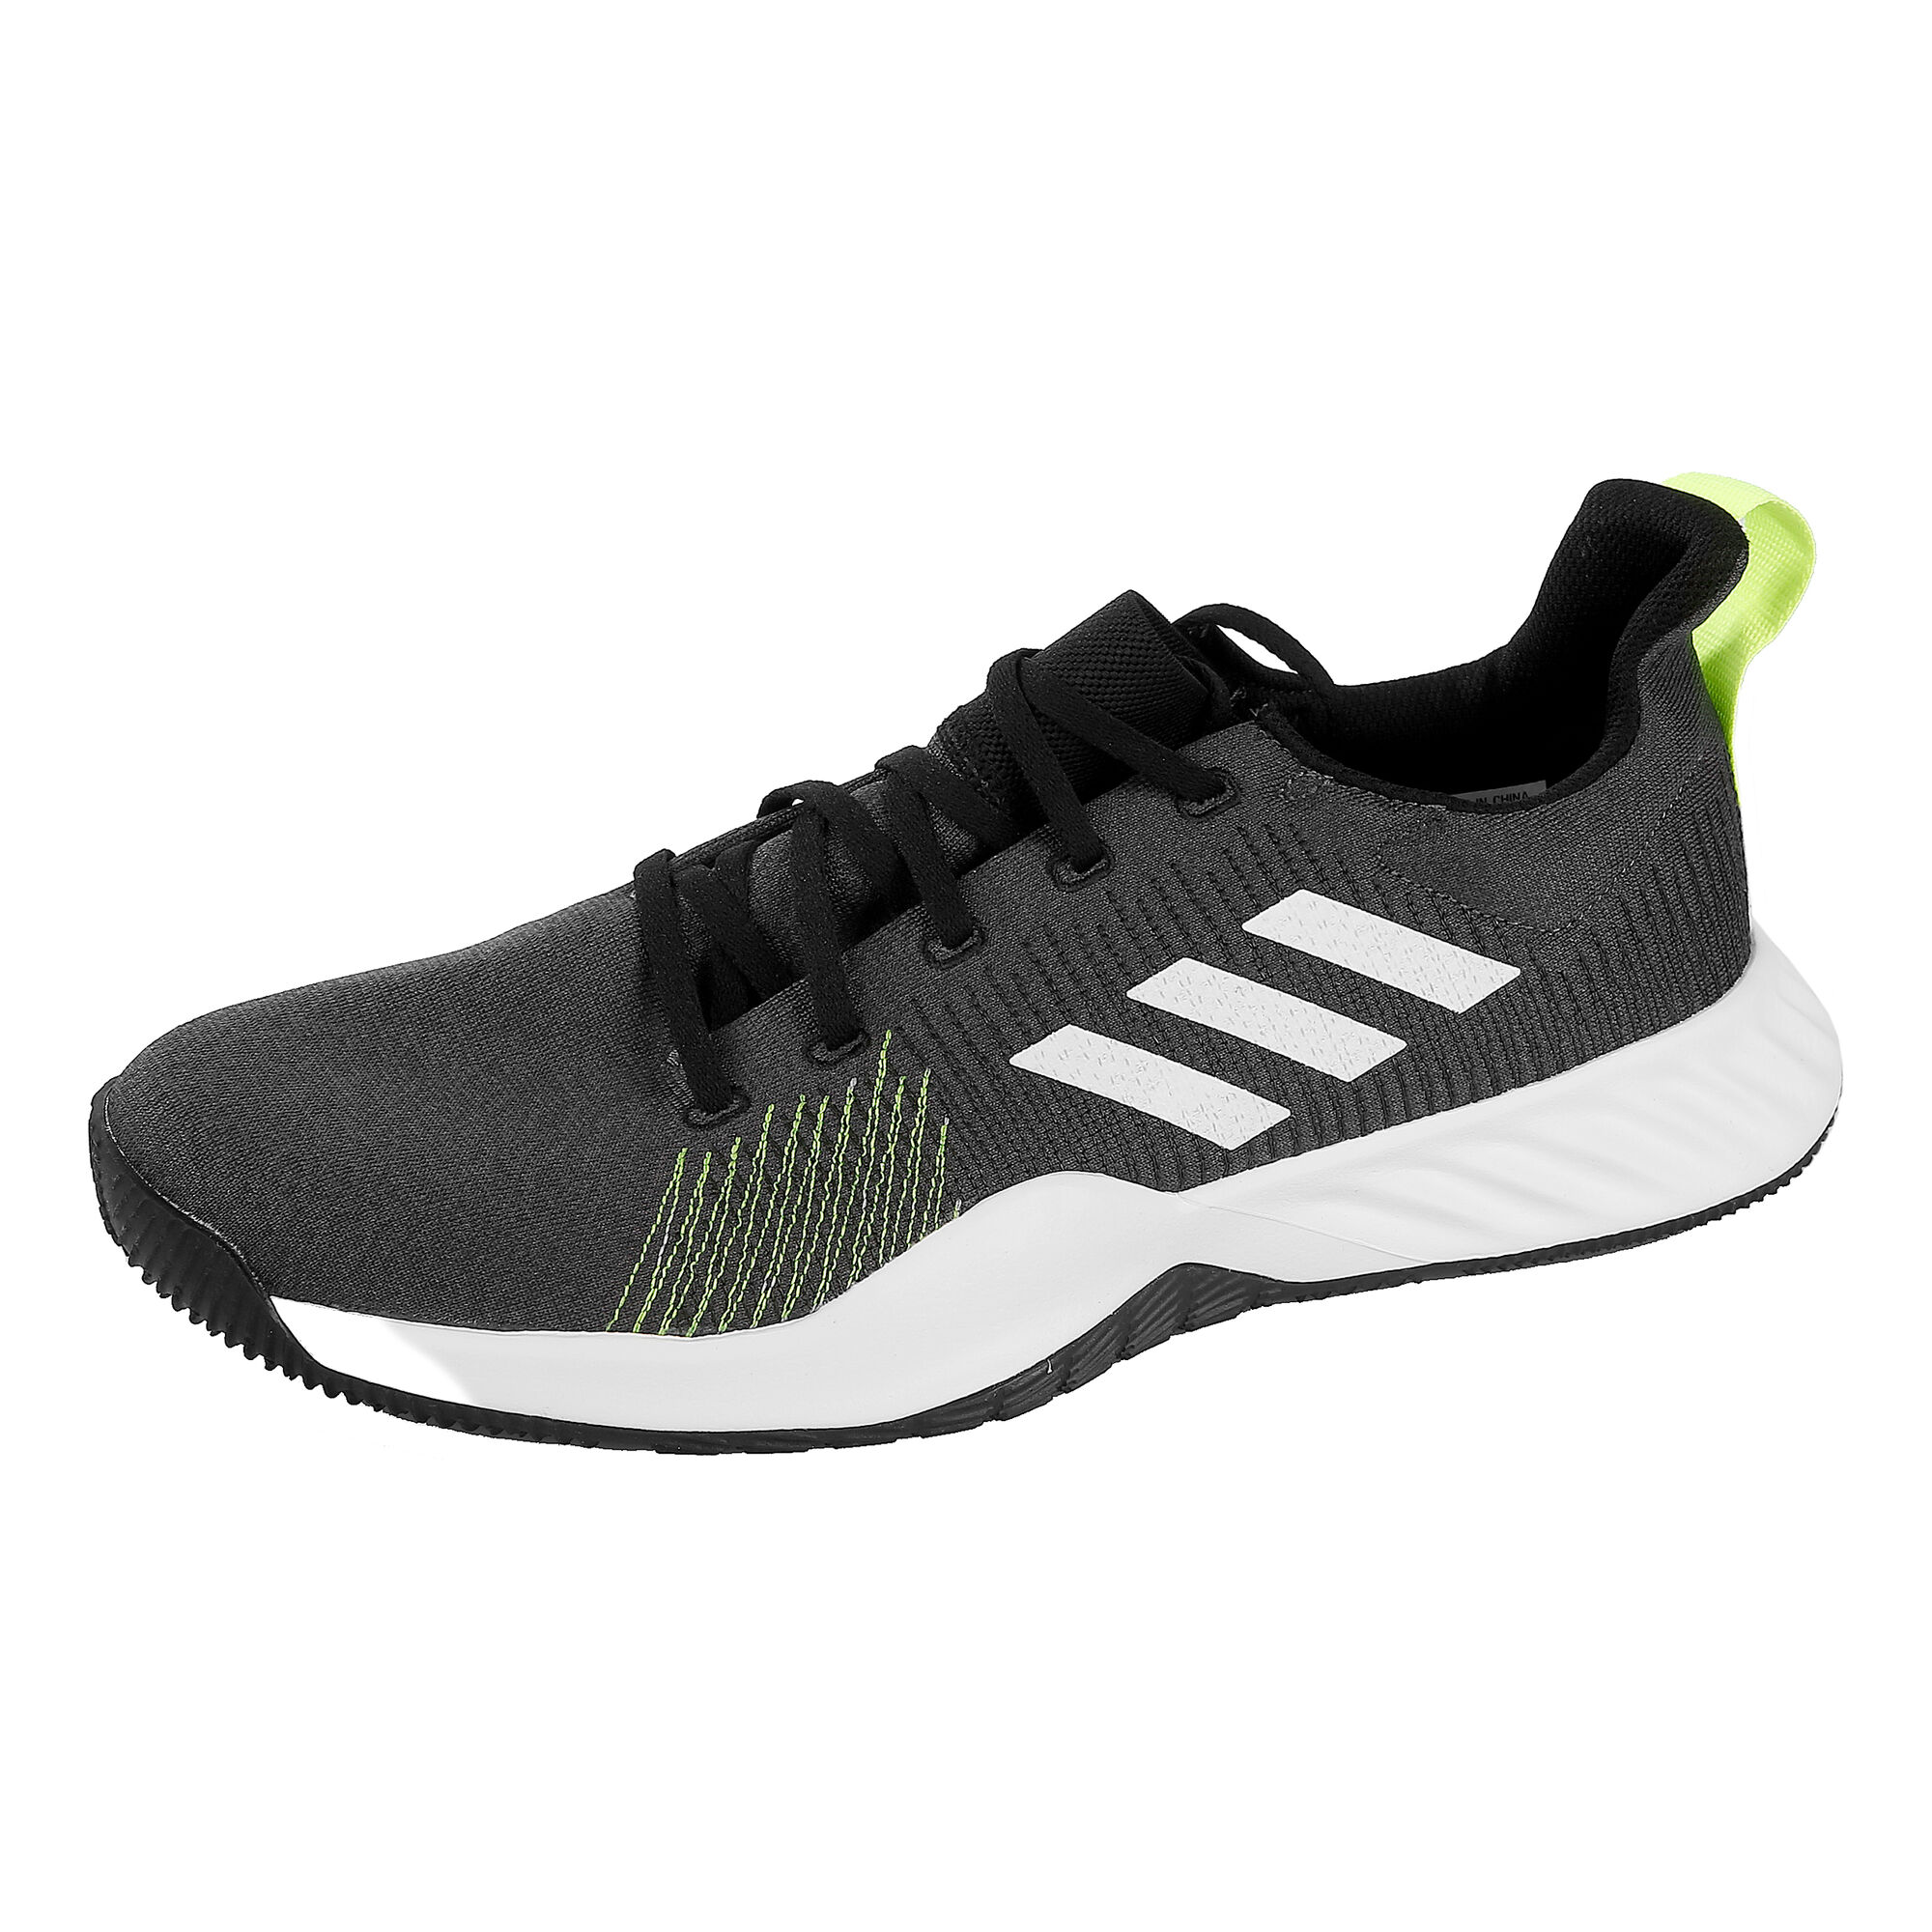 99d7a9f7733a0 buy adidas Solar LT Trainer Fitness Shoe Men - Black, White online ...